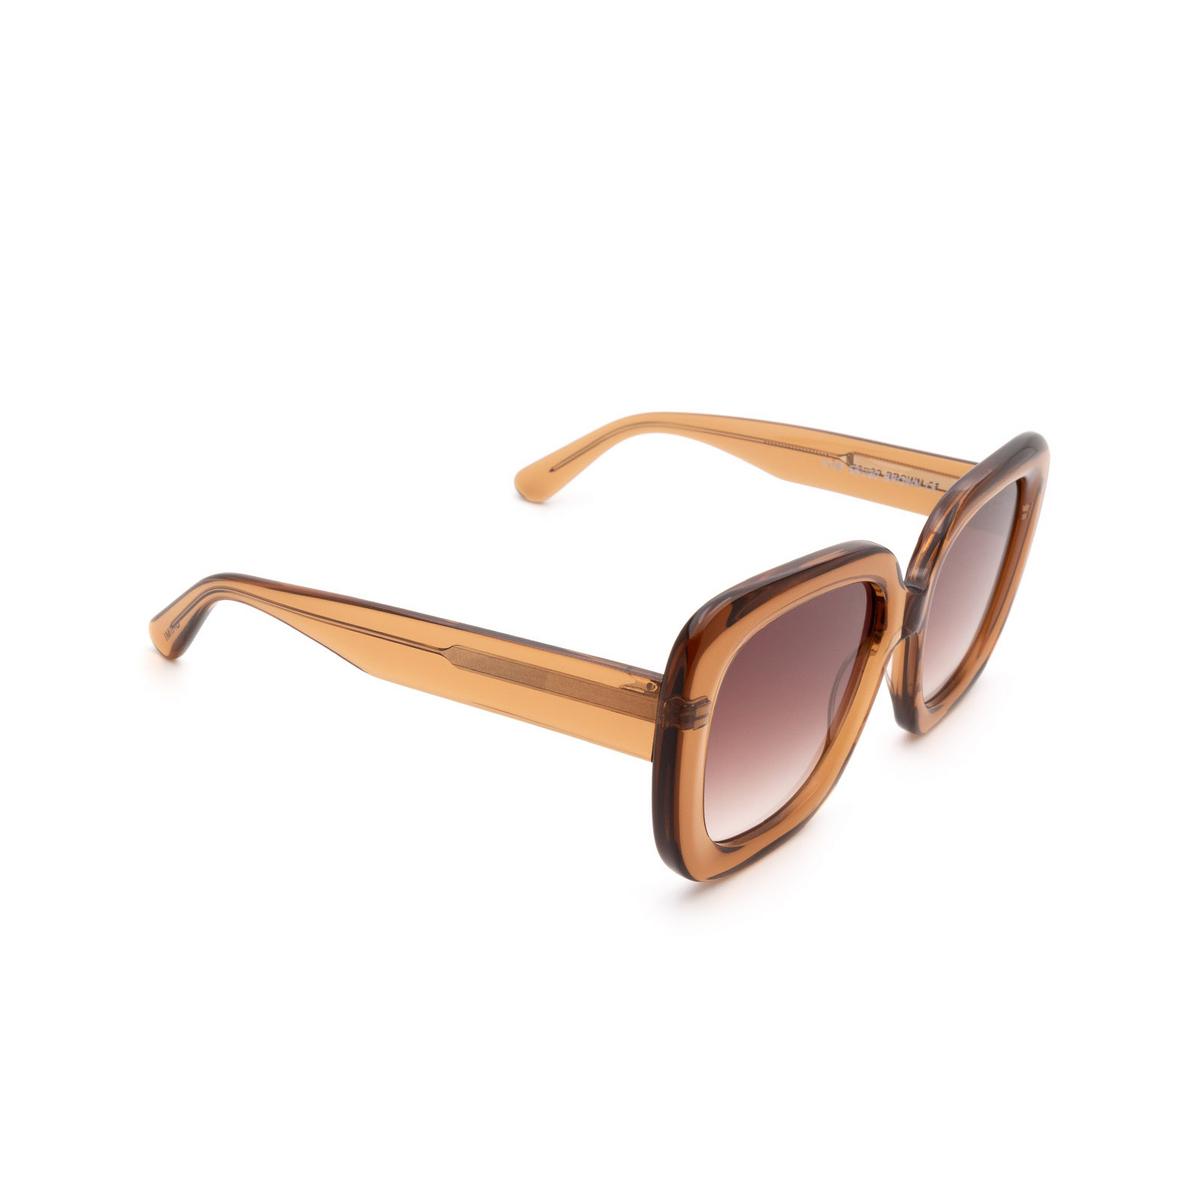 Chimi® Square Sunglasses: #108 color Brown - three-quarters view.